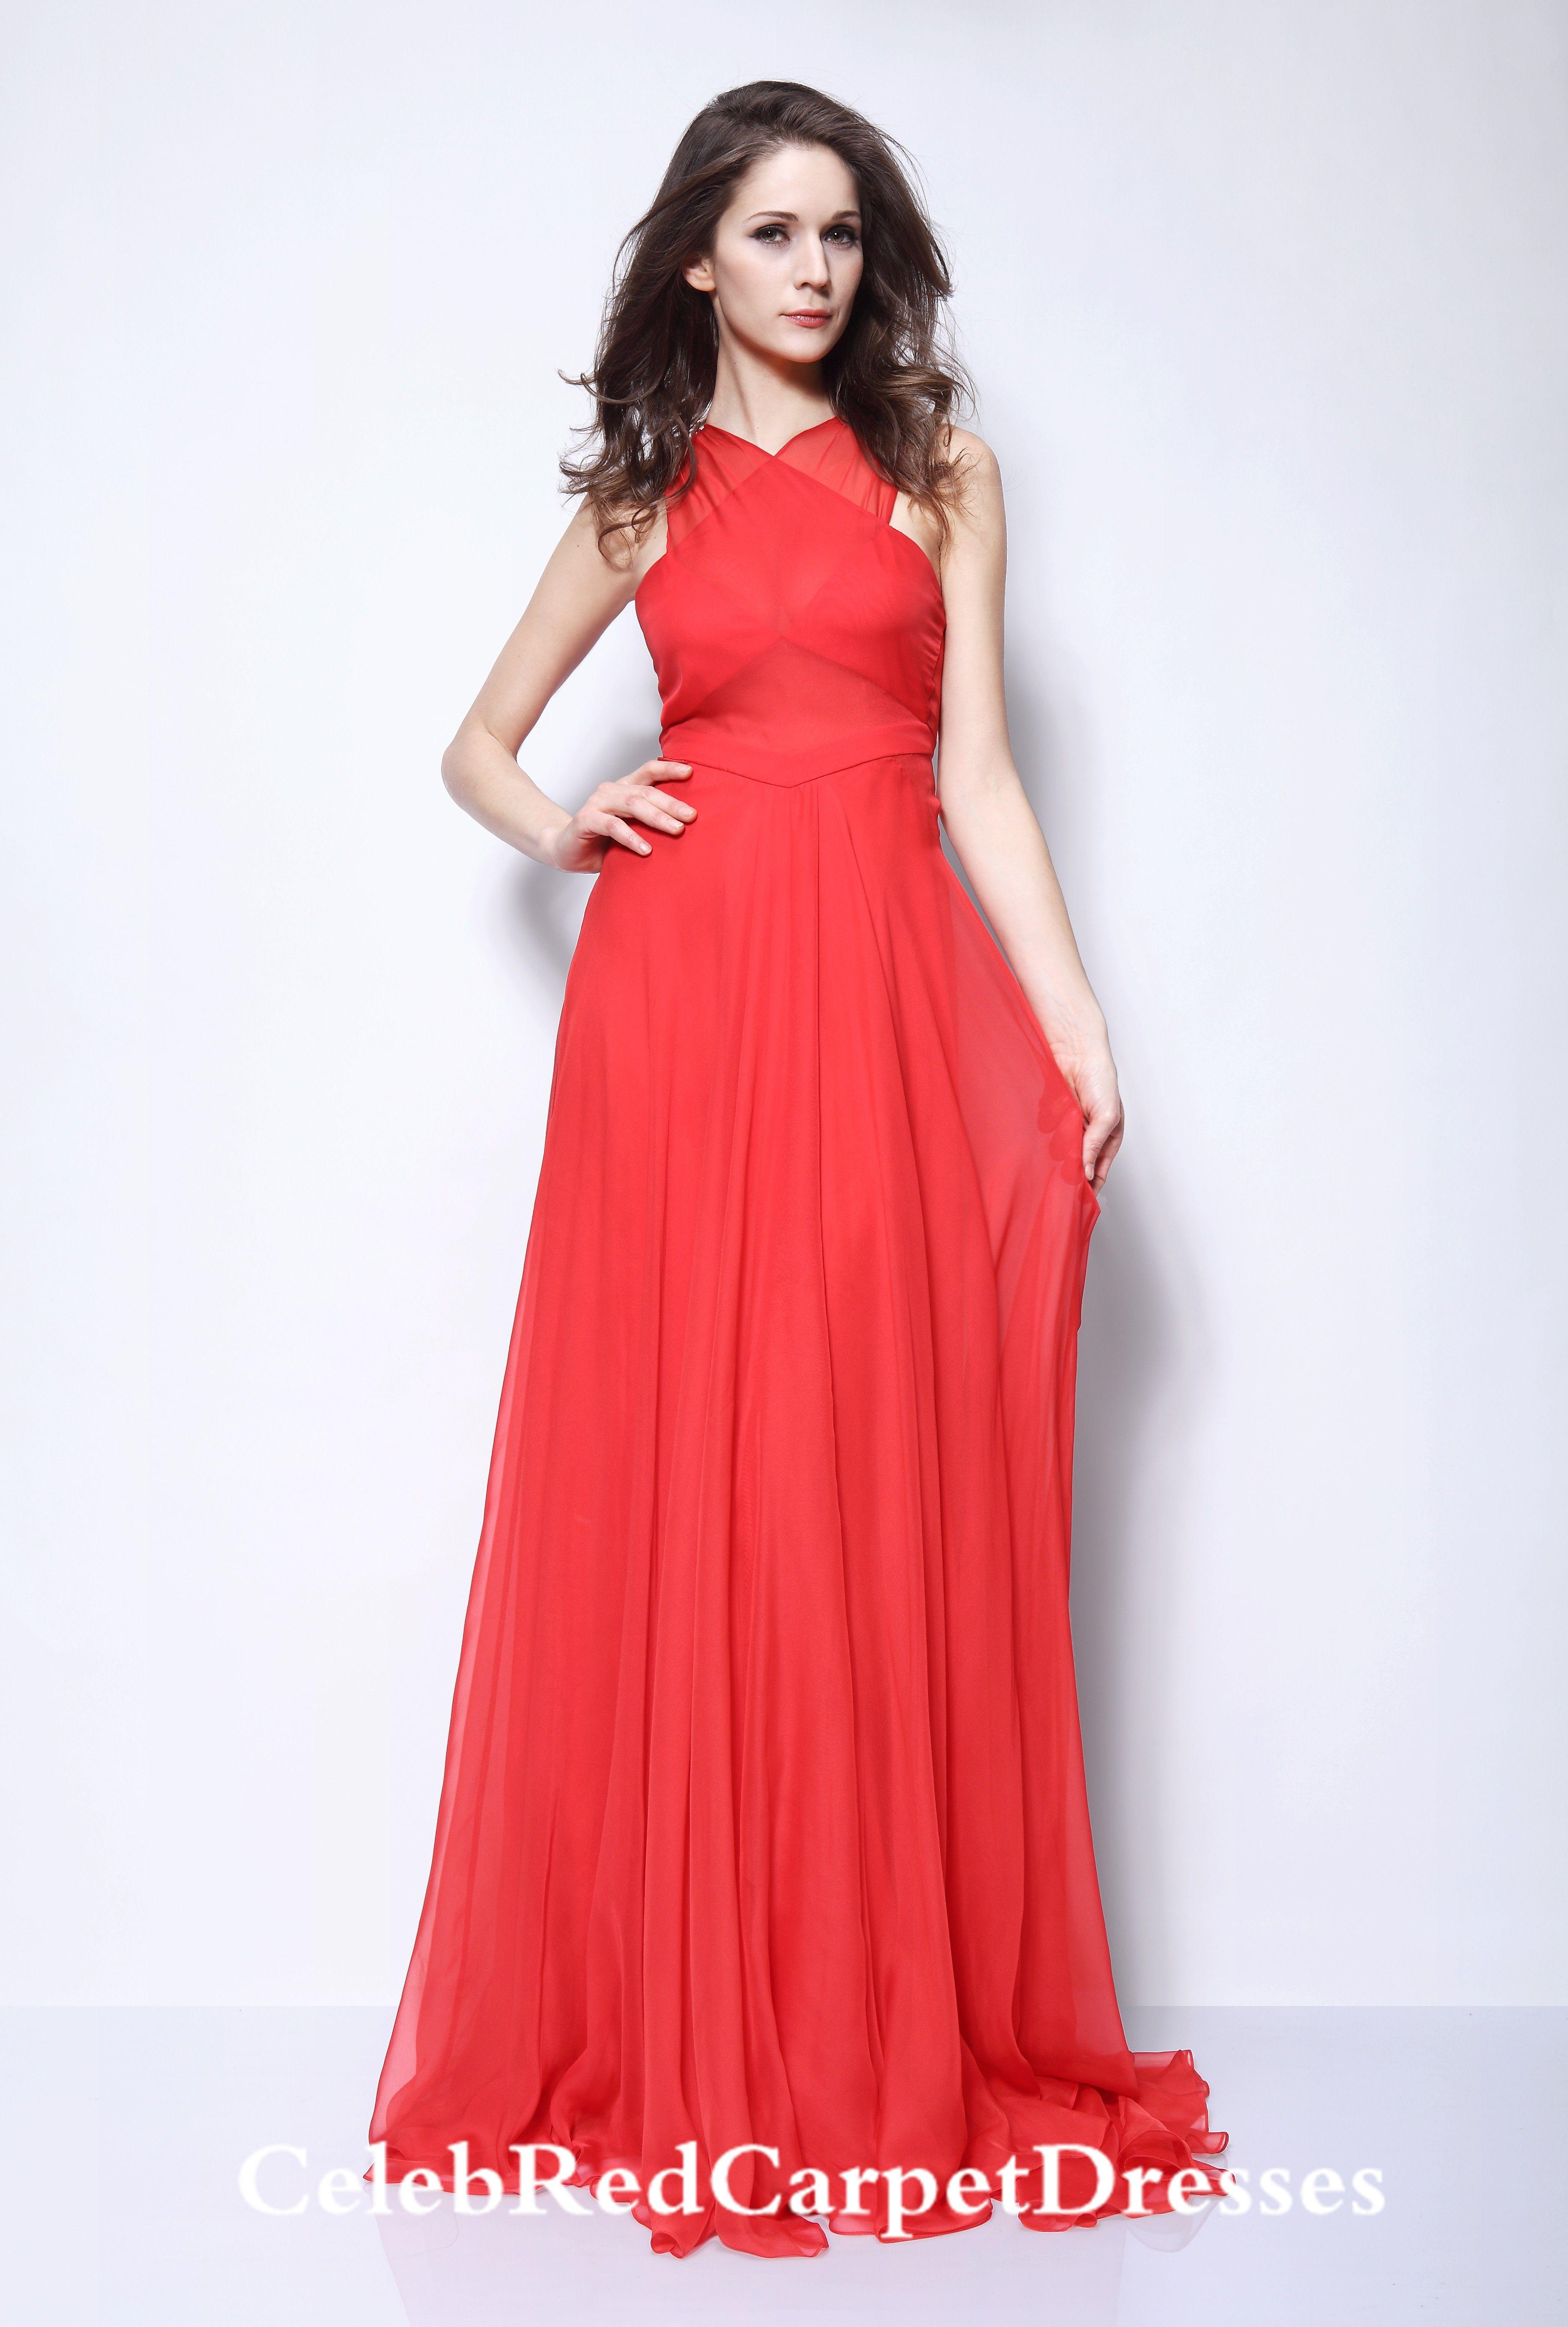 Rihanna Red Dress at Grammy Awards 2013 | Chiffon evening ...